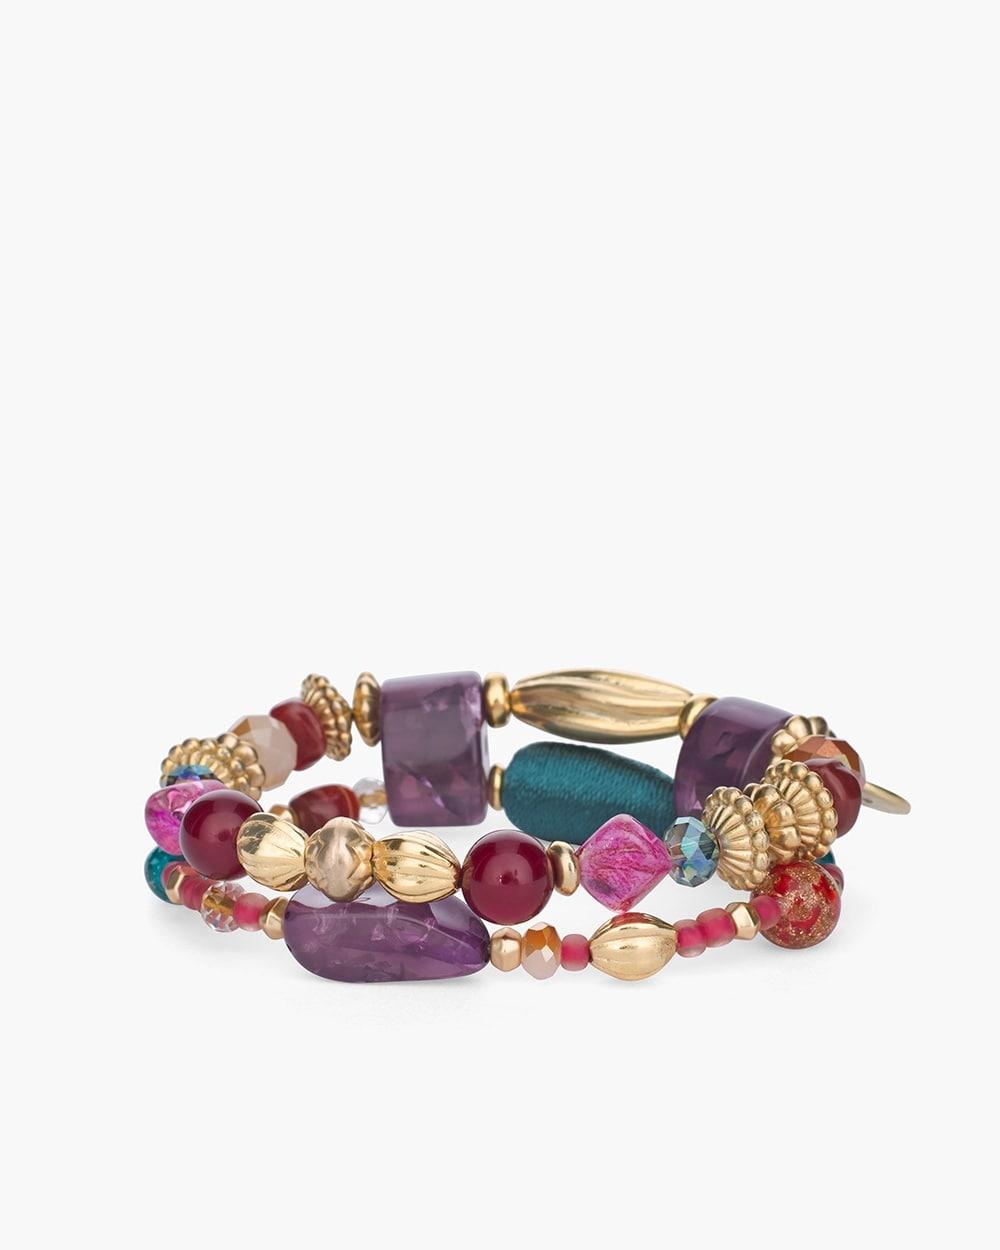 772726ee81 Multi-Colored Stone Stretch Bracelet - Chico s